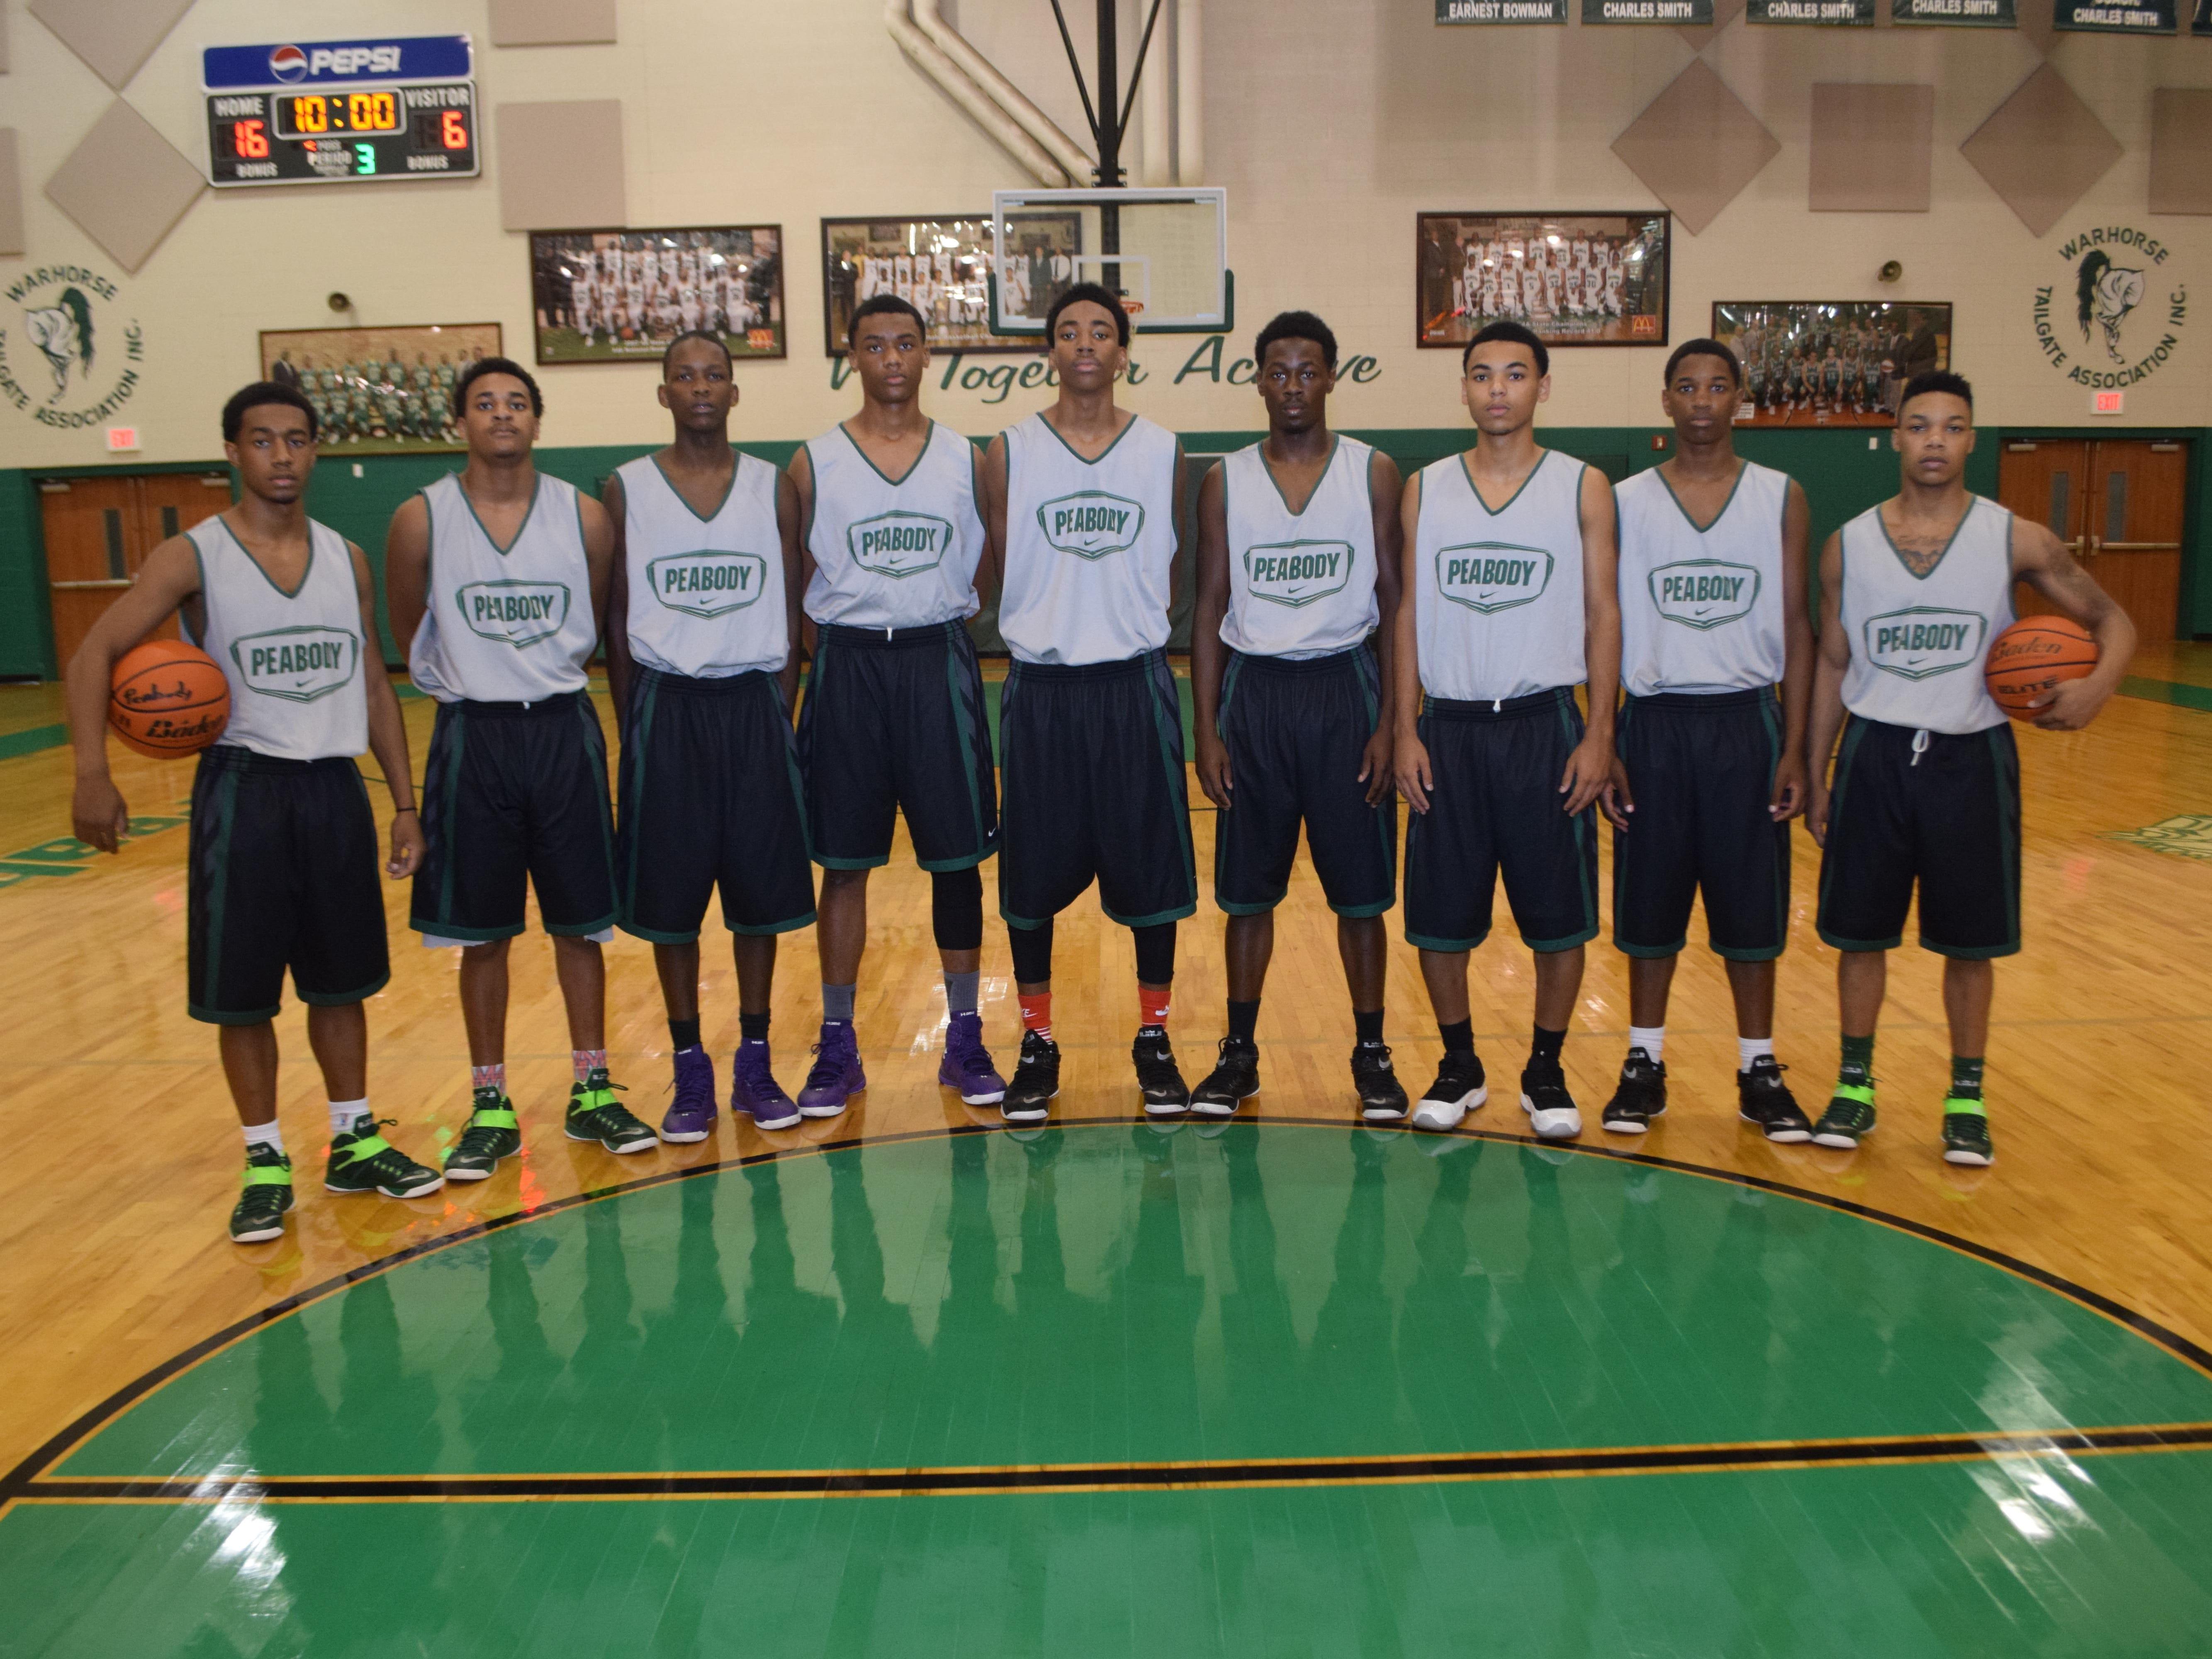 The Peabody Magnet High School basketball team won the Houston National Summer Showcase Sunday.